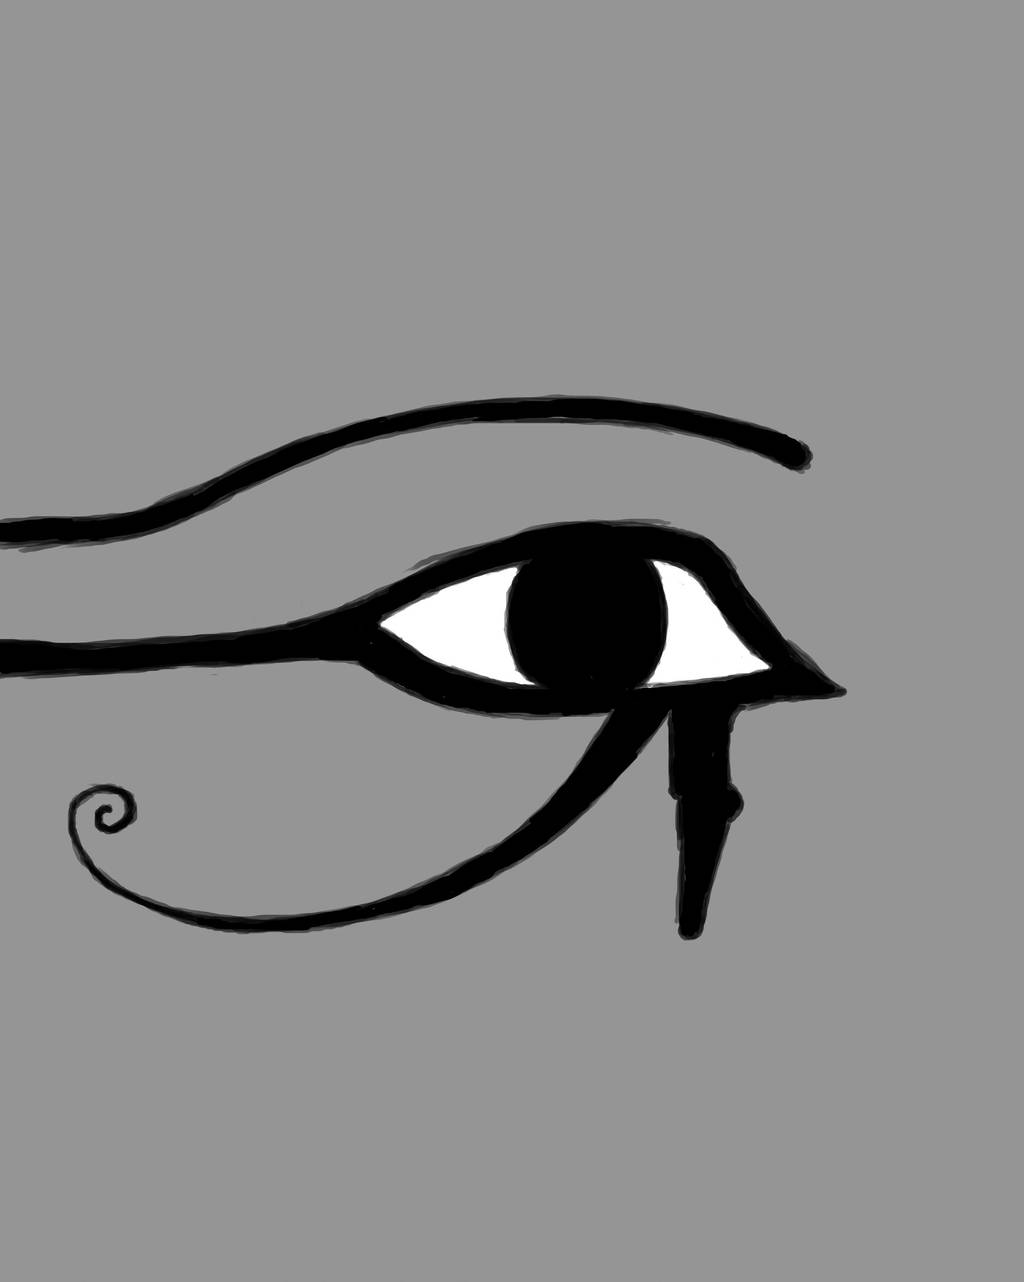 Eye of Horus Daily sketch #887 by GothicVampireFreak